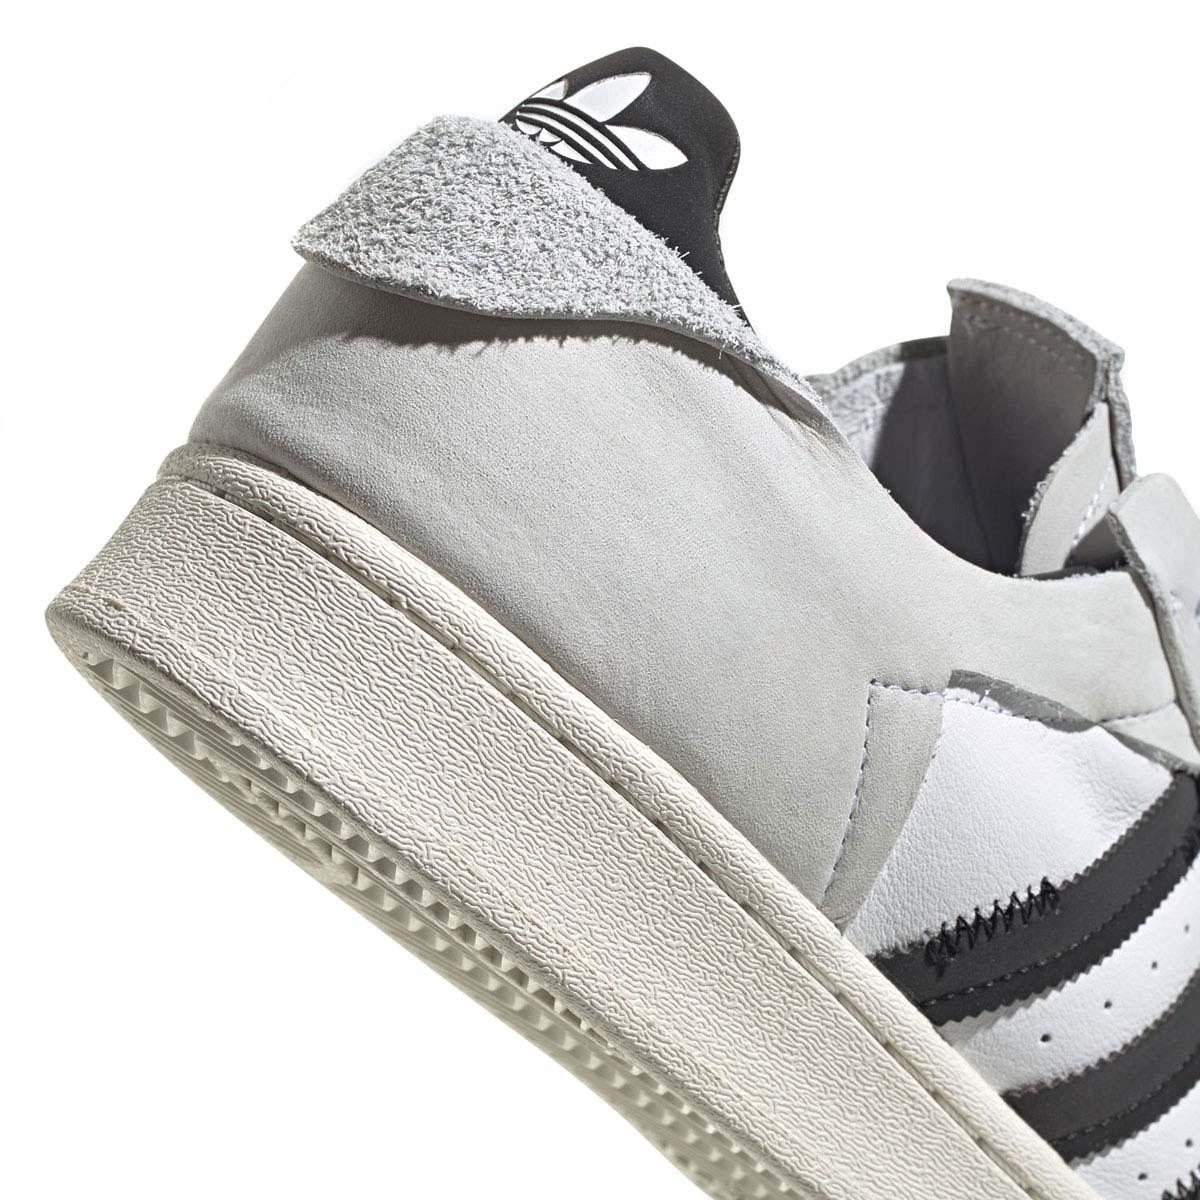 adidas SUPERSTAR FOOTWEAR WHITE / CORE BLACK / OFF WHITE FV3024 アディダス スーパースター ホワイト/ブラック/グレー